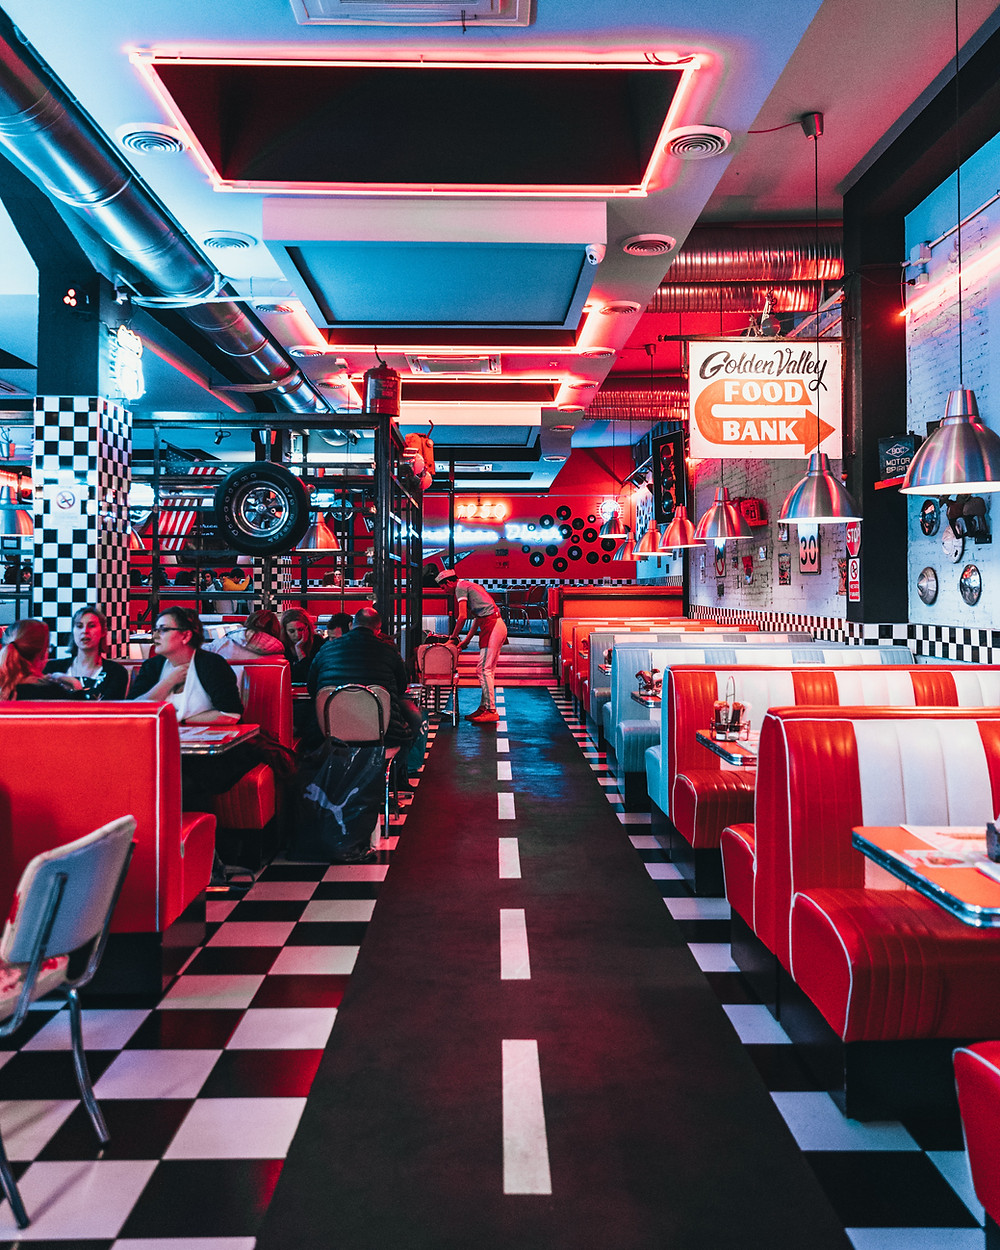 Designer Restaurant Floor